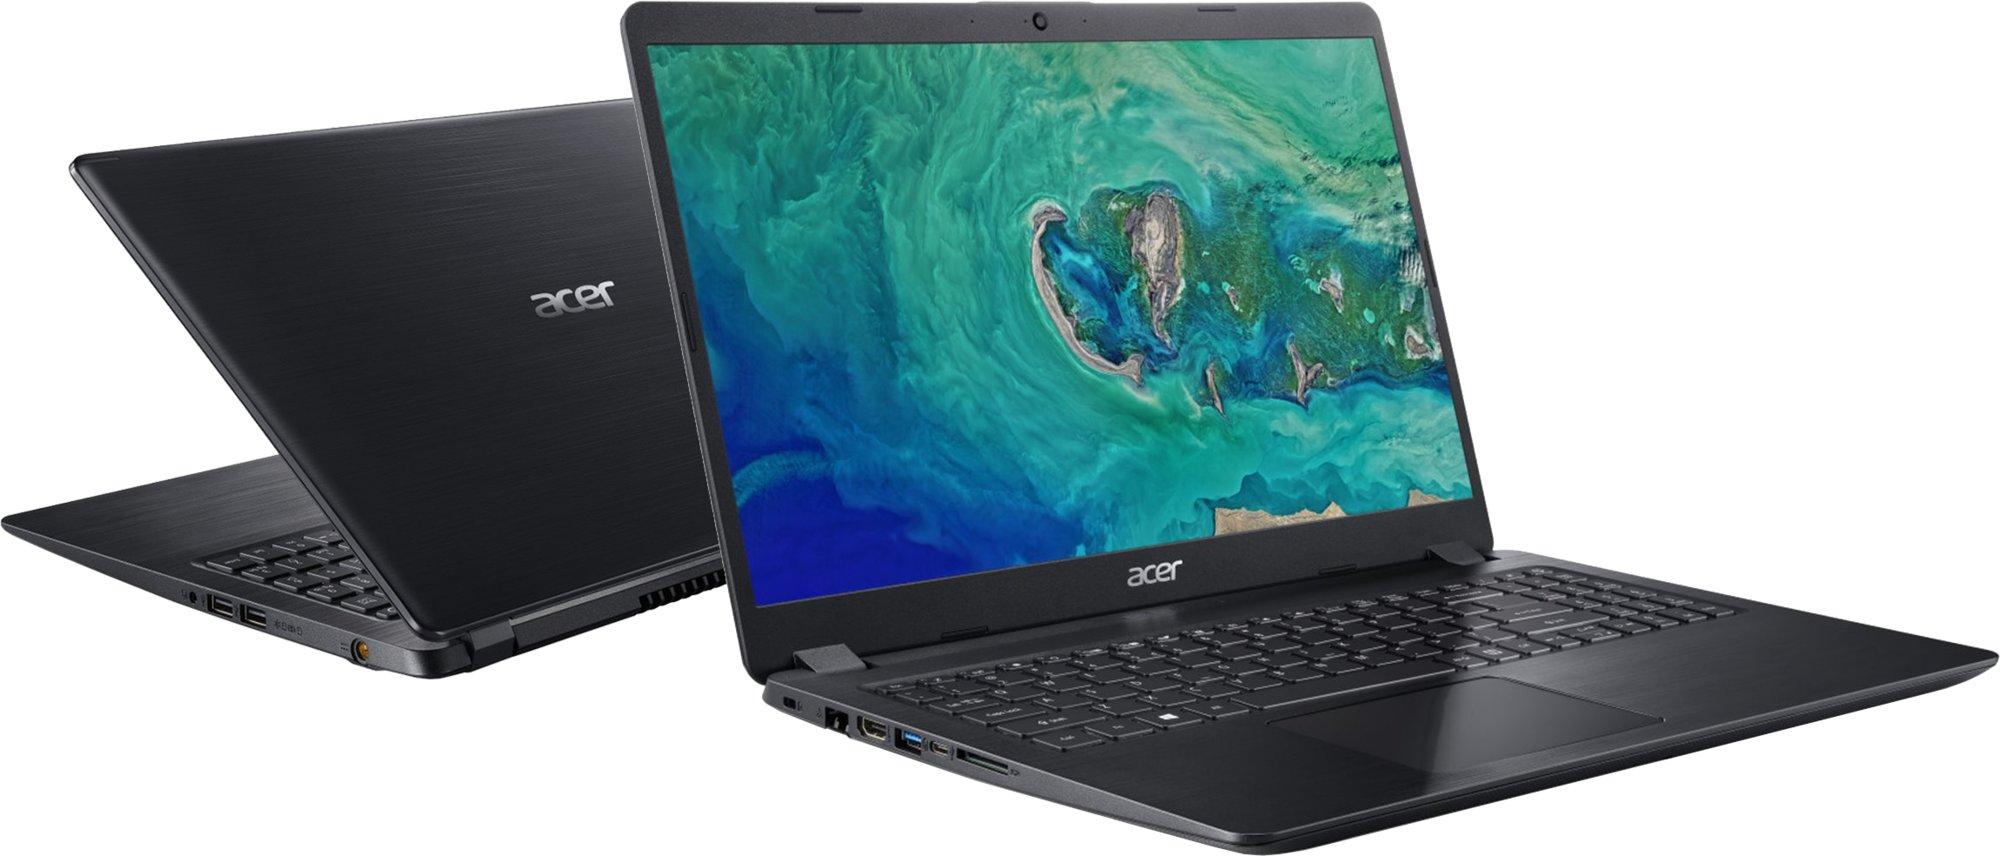 Acer Aspire 5 A515-52G-596L